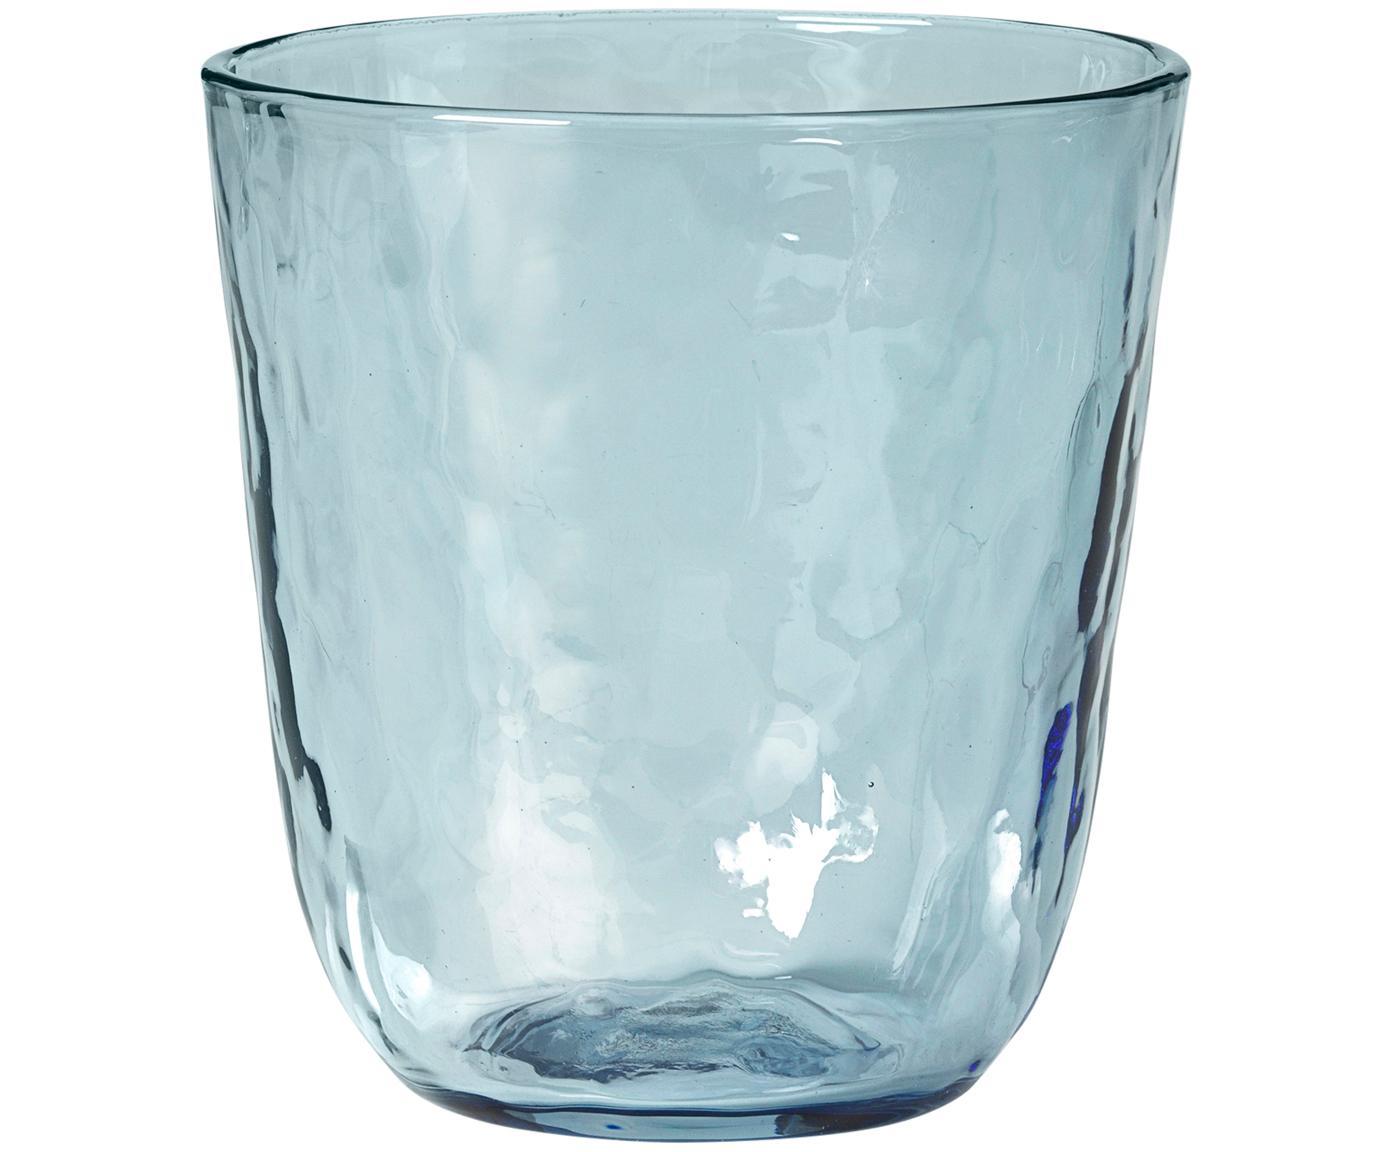 Vasos de vidrio soplado Hammered, 4uds., Vidrio soplado, Azul, transparente, Ø 9 x Al 10 cm